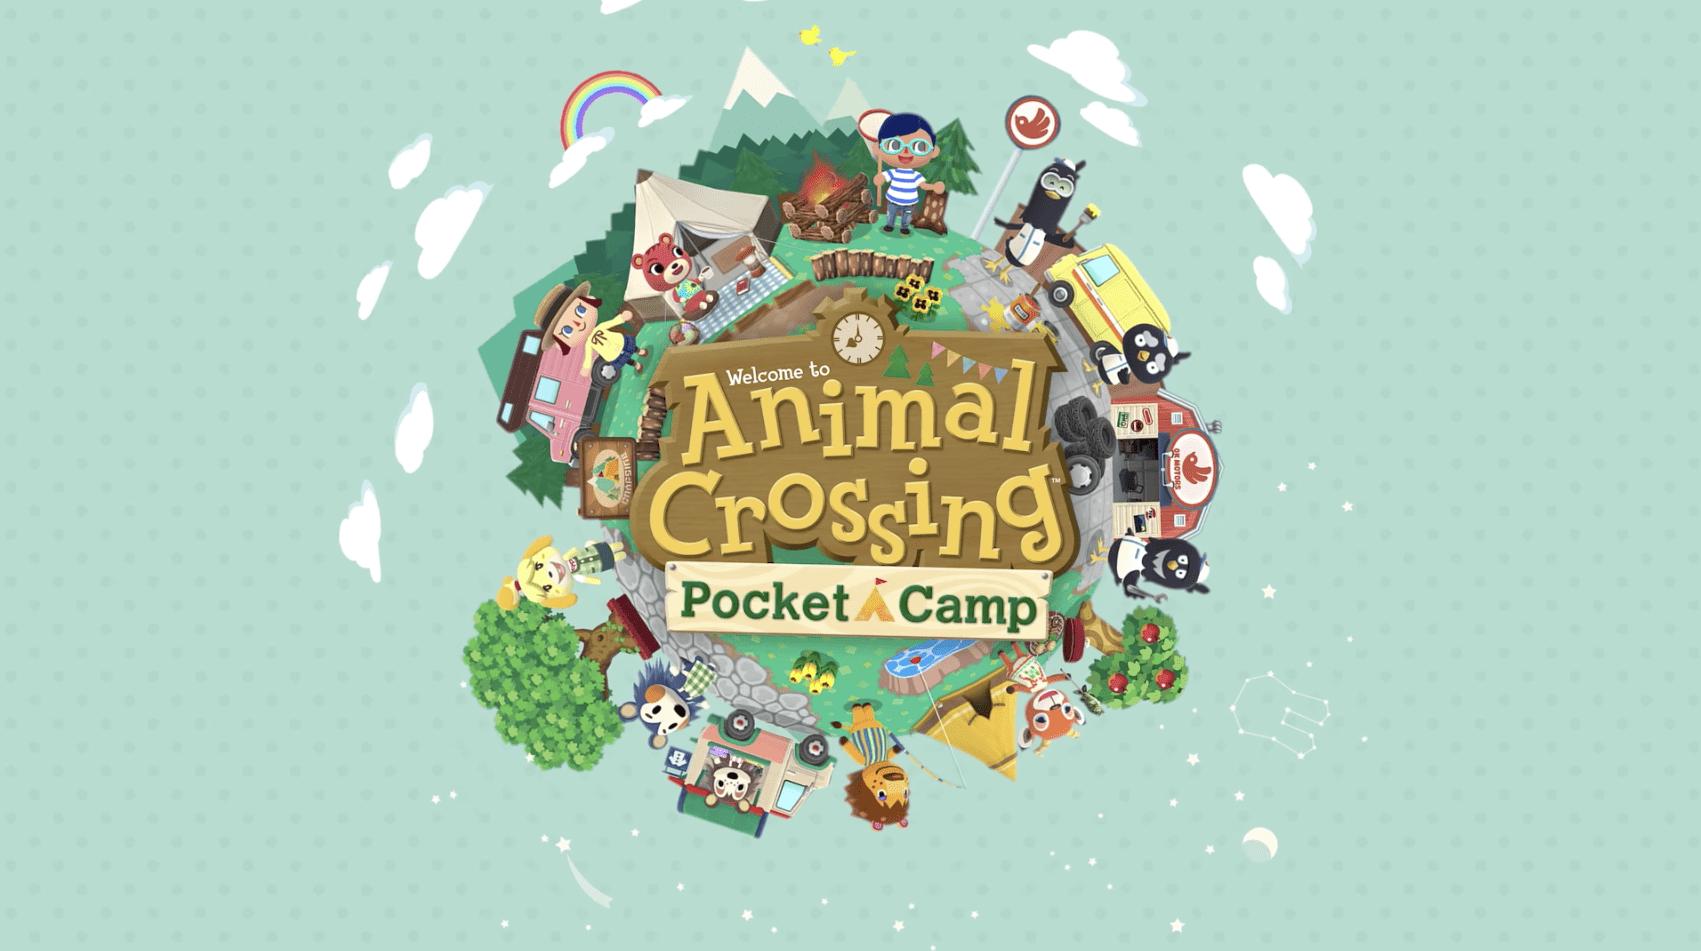 Animal Crossing Pocket Camp arrives in November for